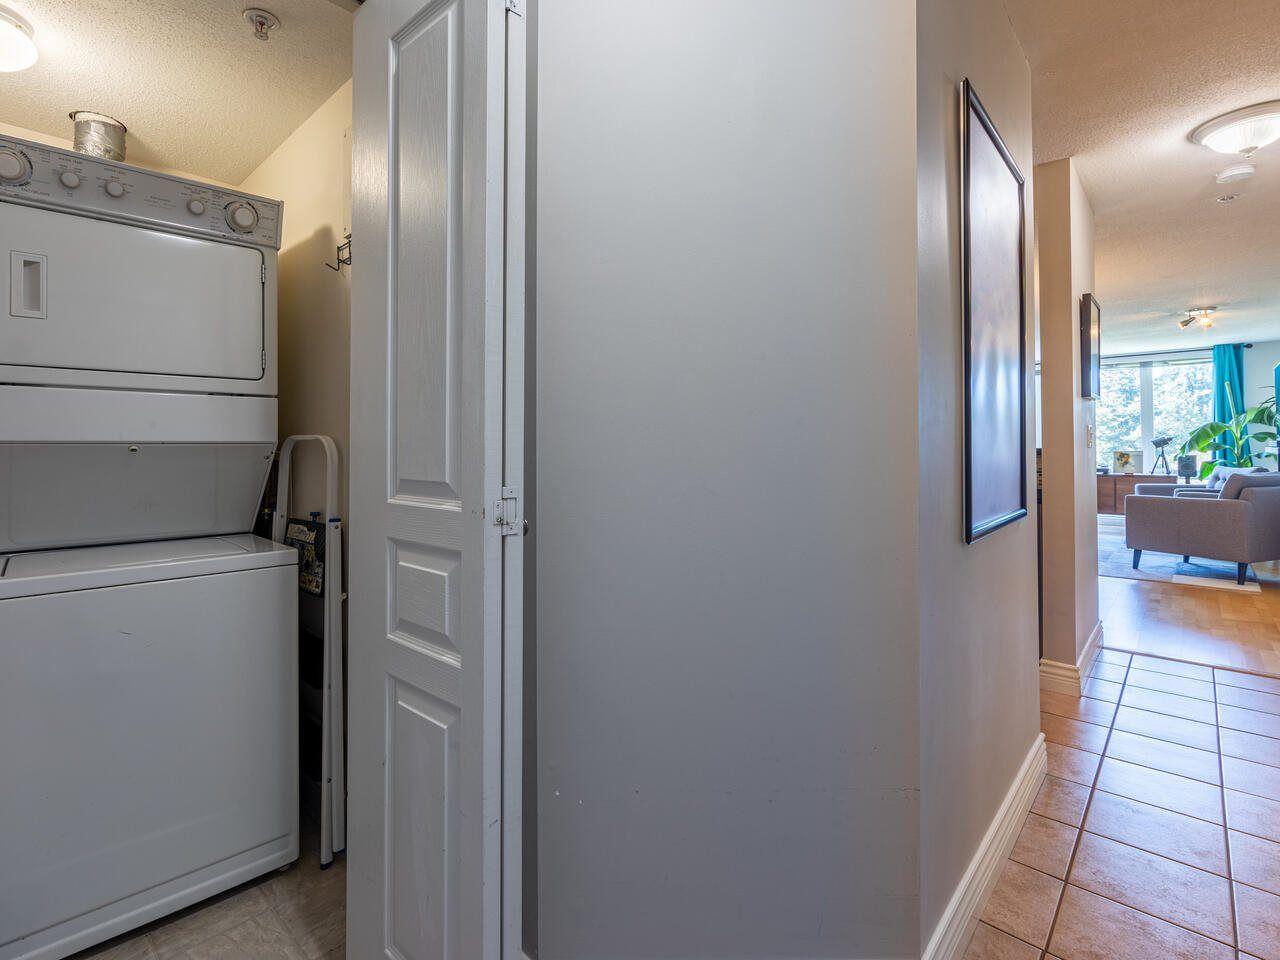 "Photo 18: Photos: 226 5800 ANDREWS Road in Richmond: Steveston South Condo for sale in ""THE VILLAS"" : MLS®# R2569641"